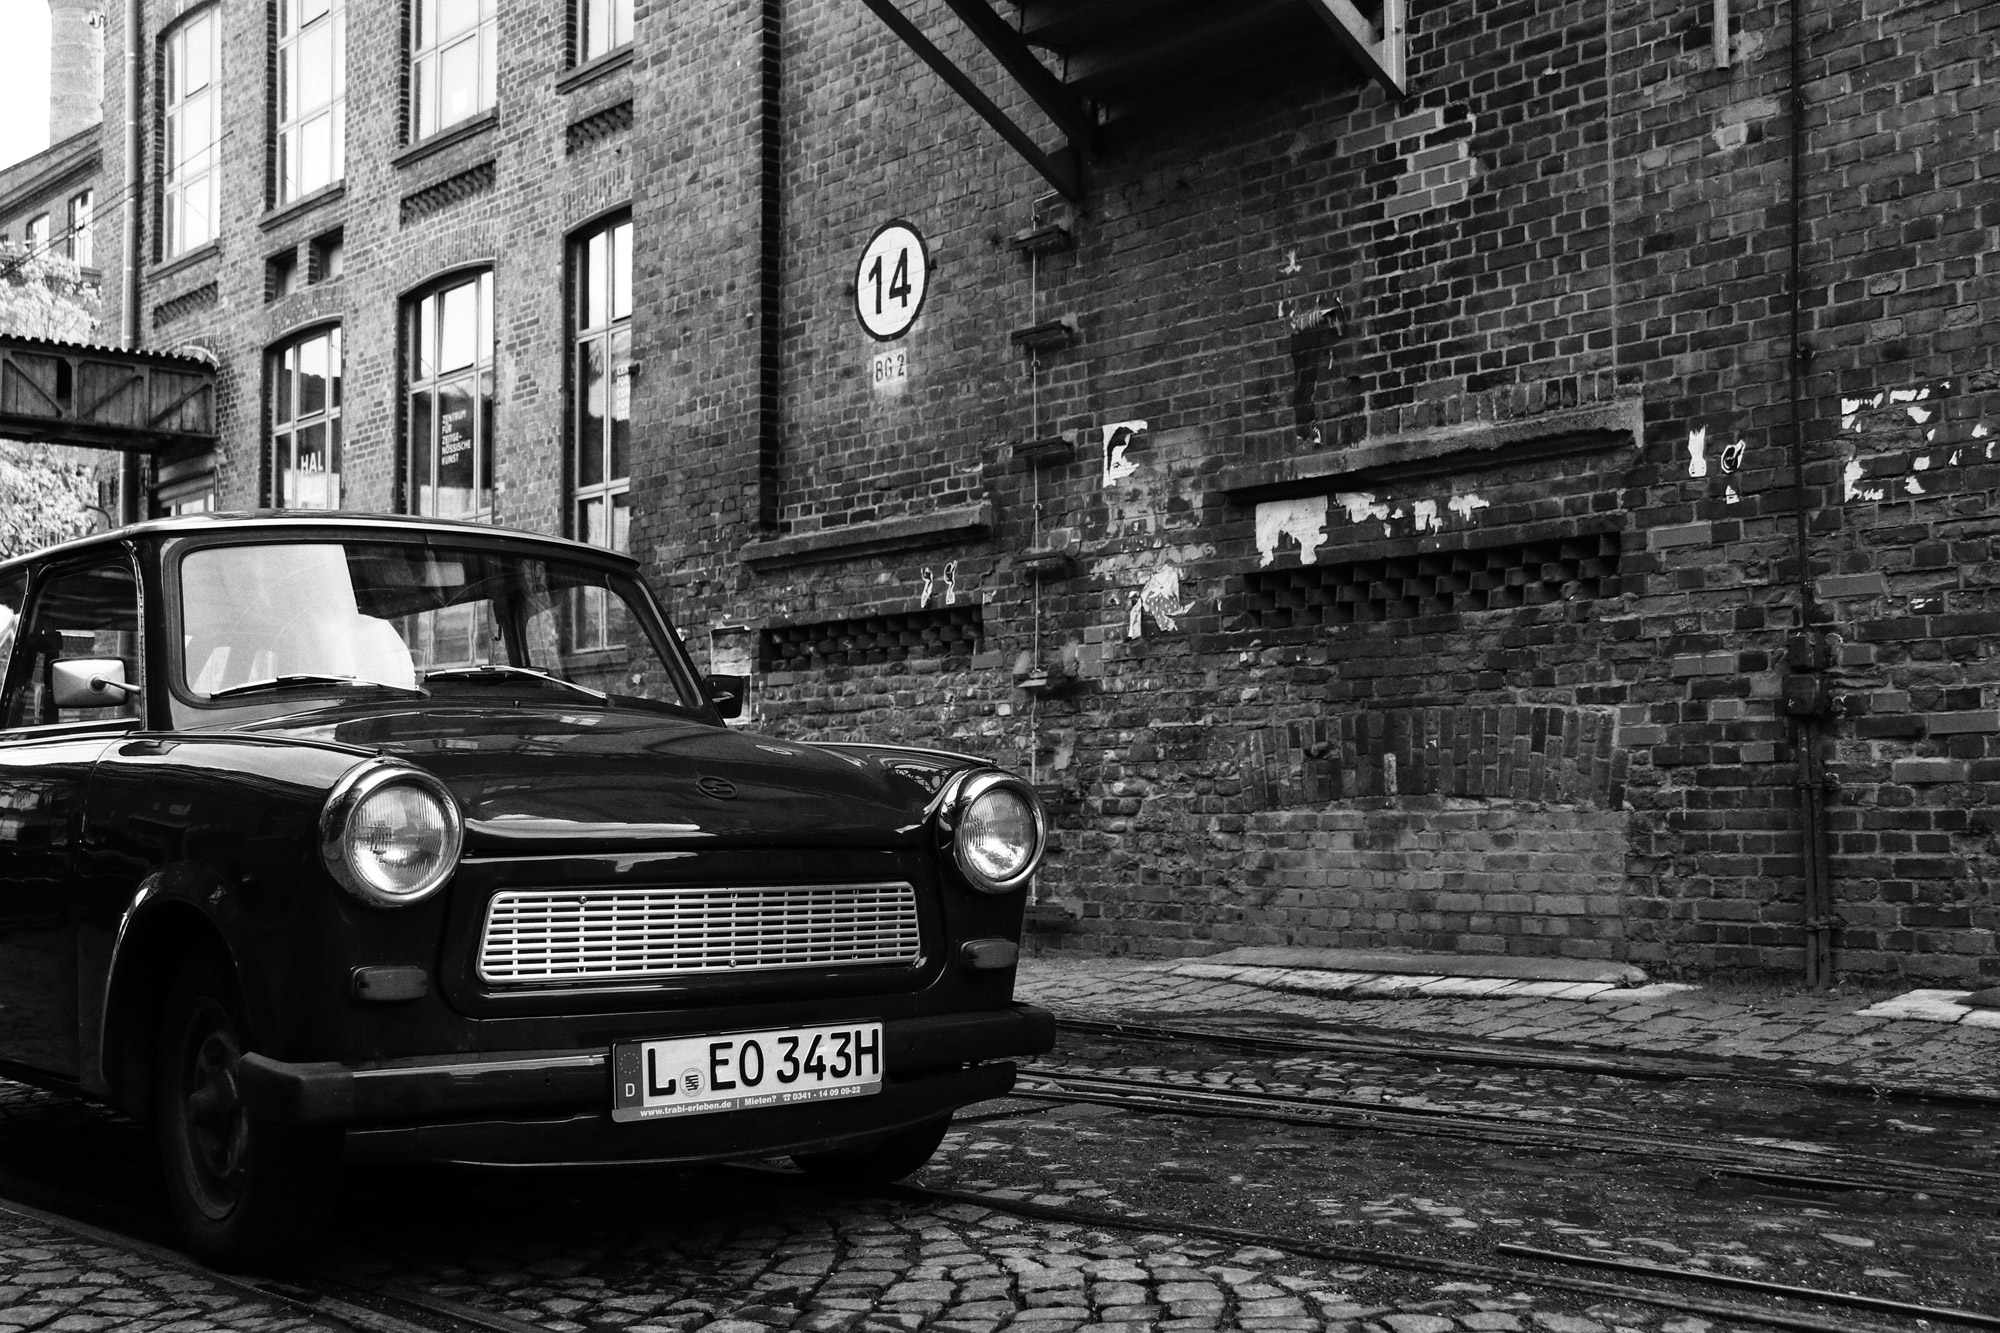 Mooiste reisfoto's van 2017 - Trabant